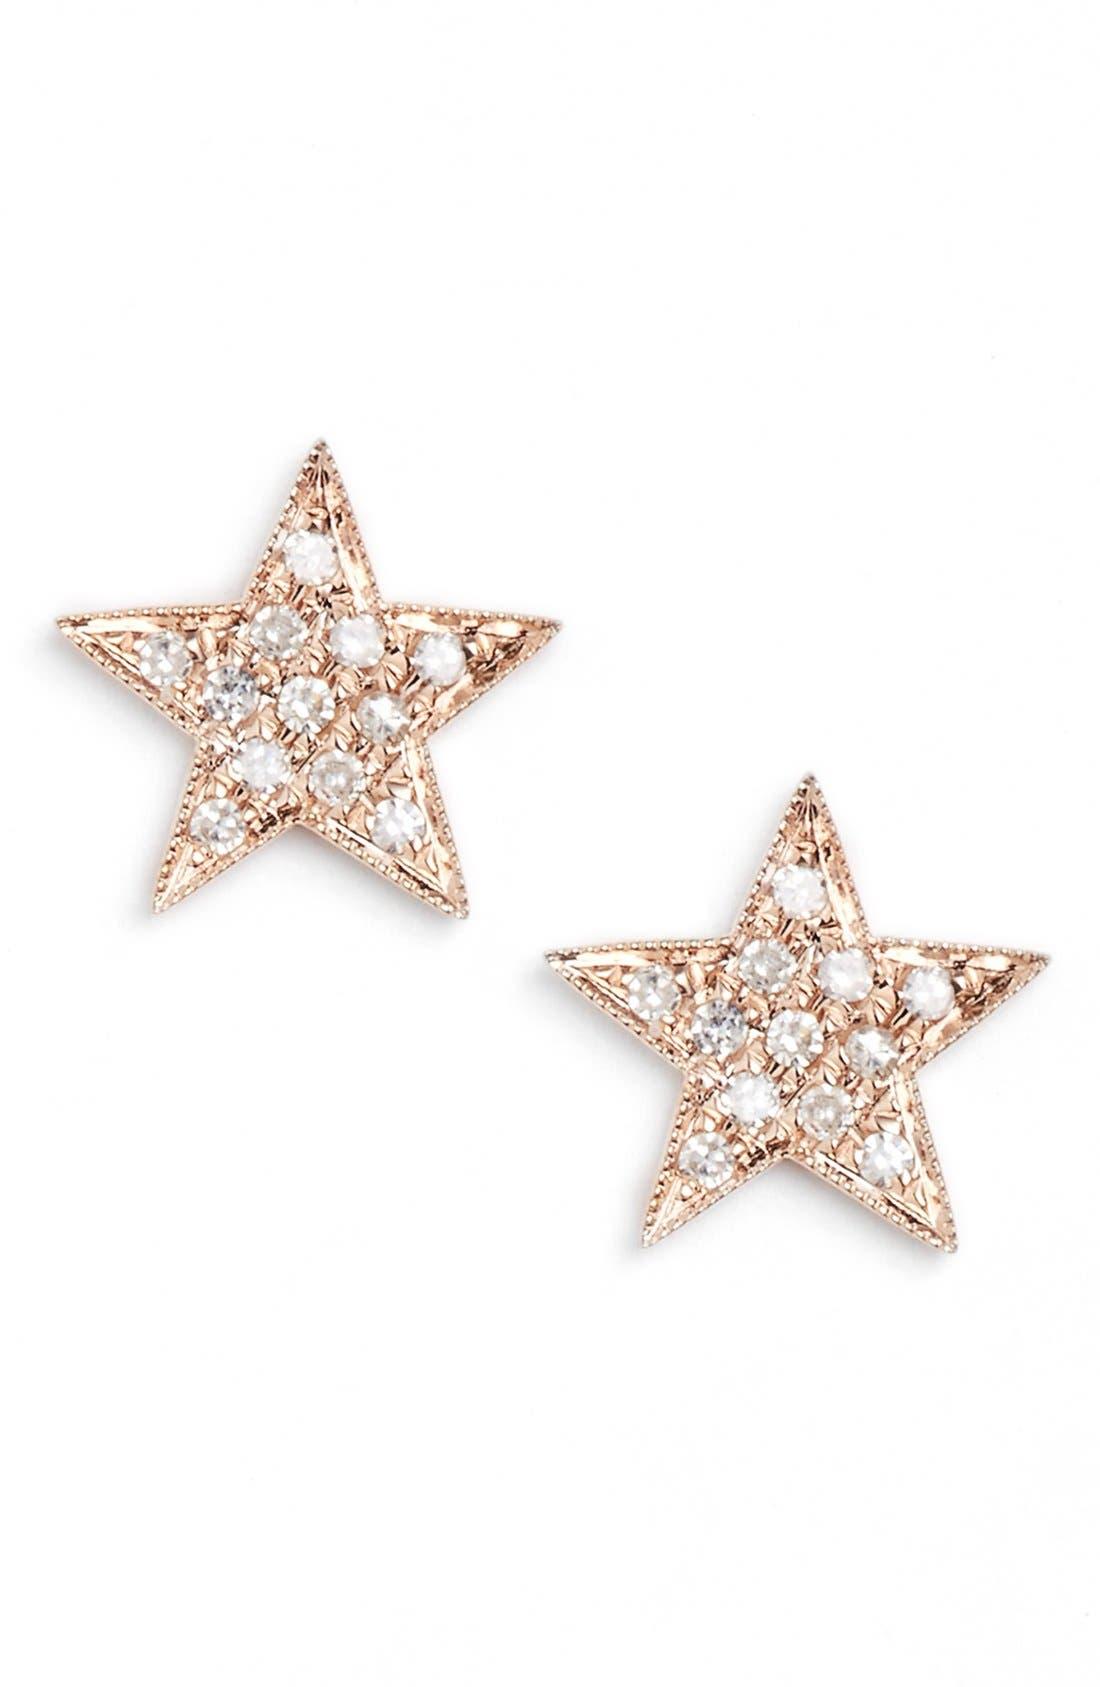 Alternate Image 1 Selected - Dana Rebecca Designs 'Julianne Himiko' Diamond Star Stud Earrings